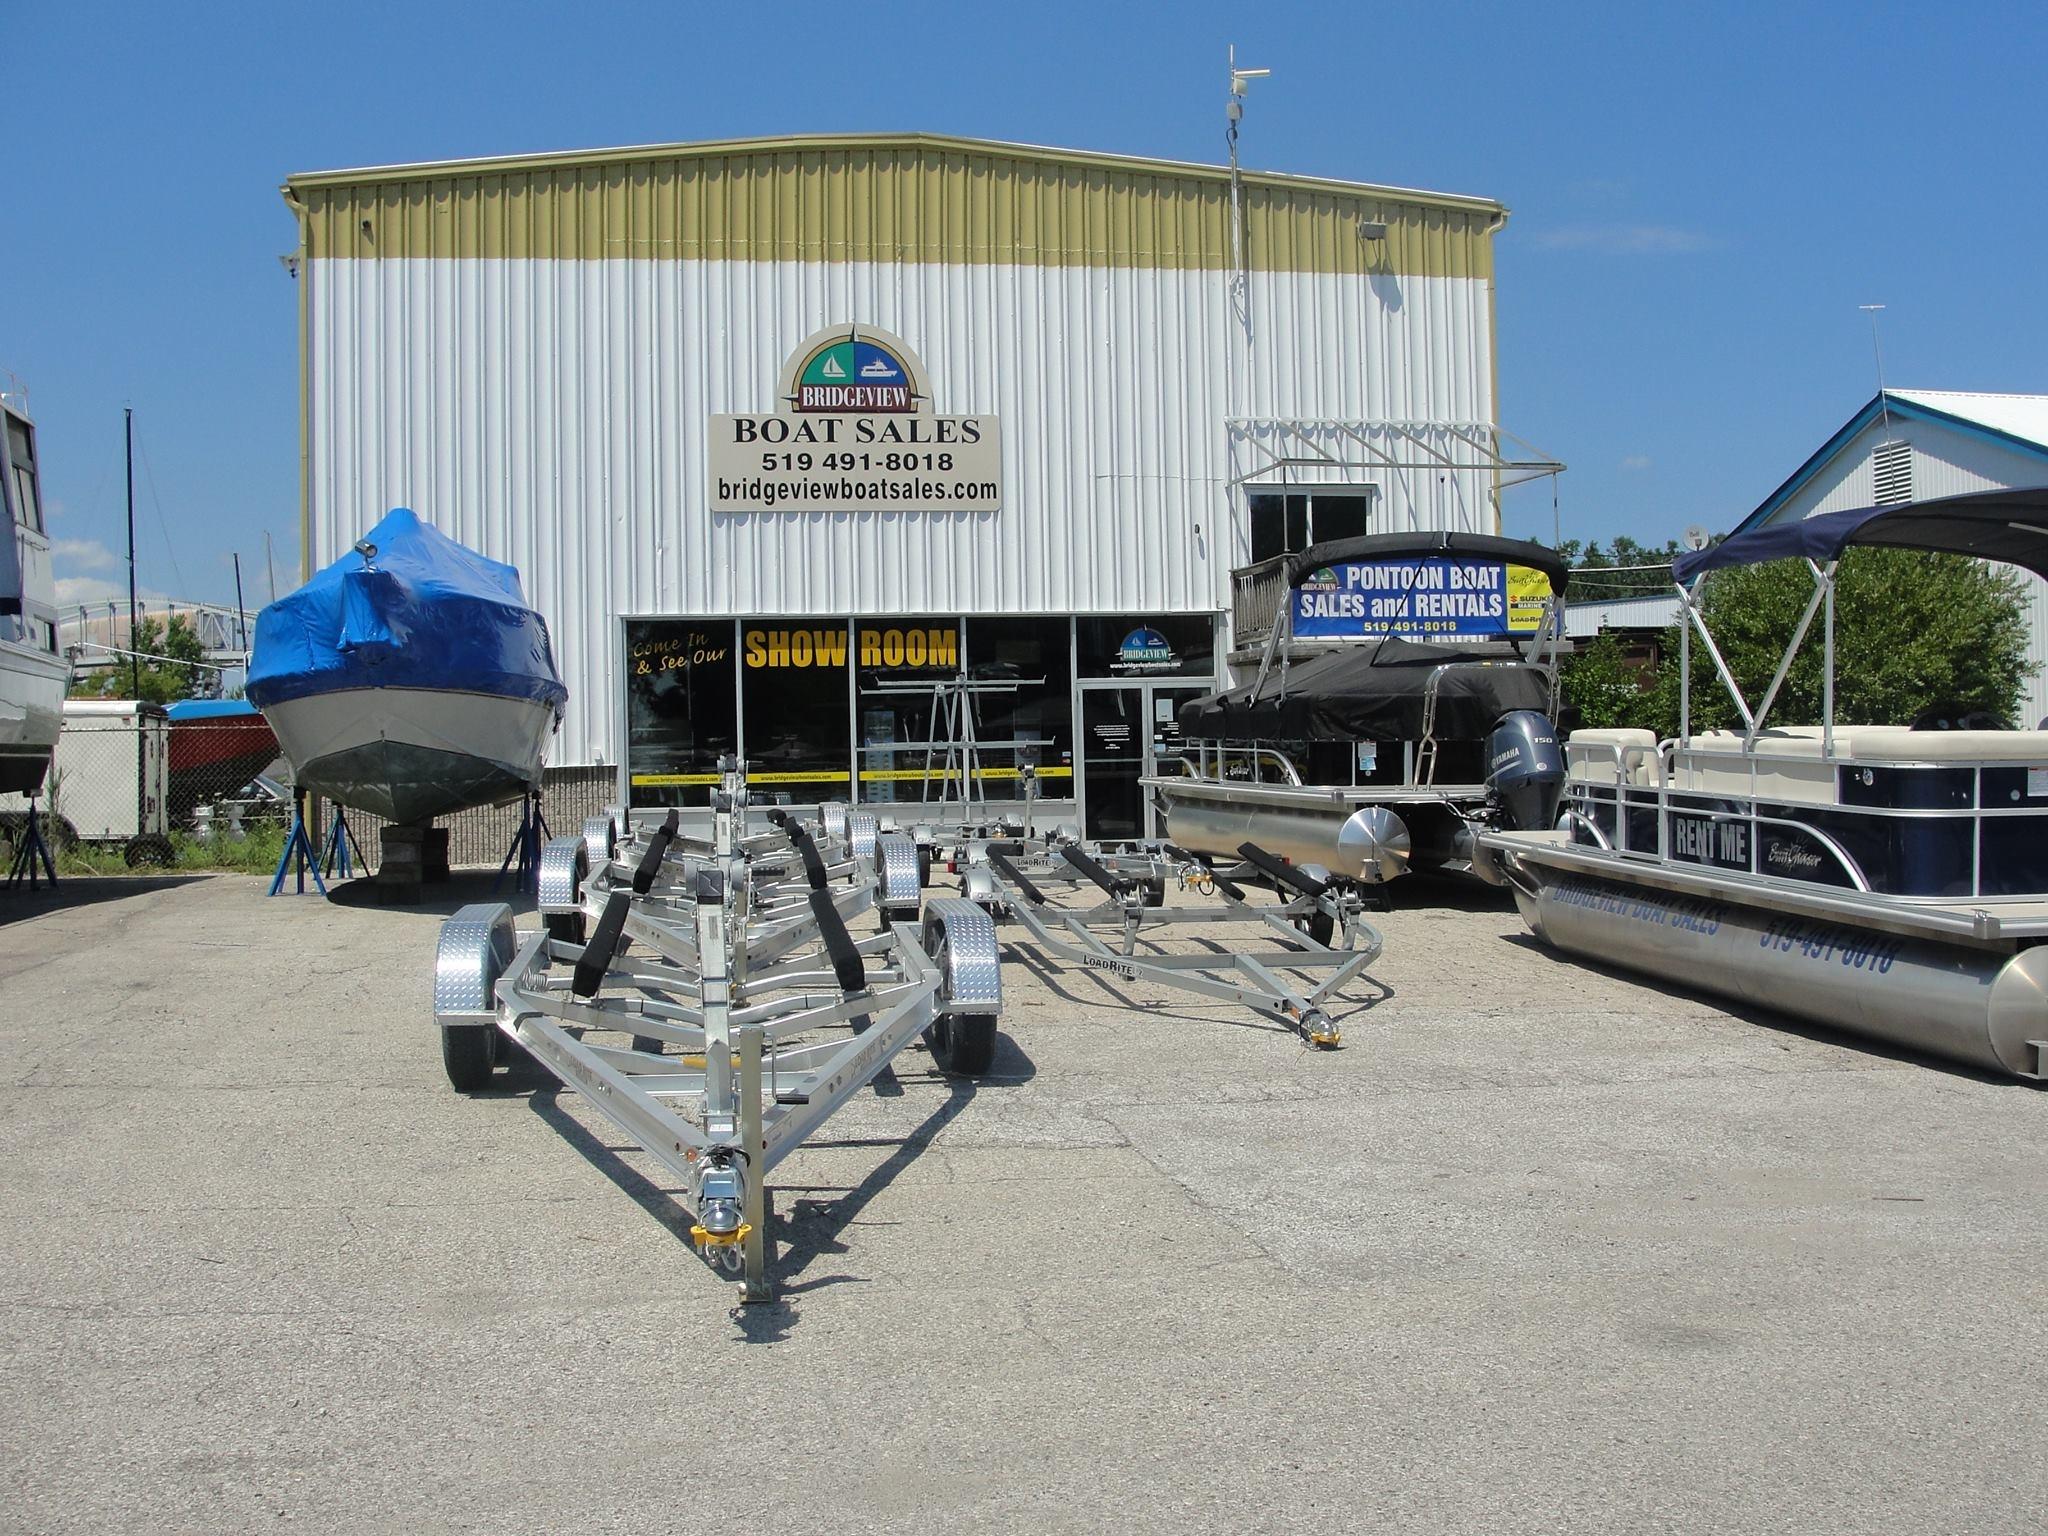 Bridgeview Boat Sales - Point Edward, ON N7T 7J7 - (519)491-8018 | ShowMeLocal.com